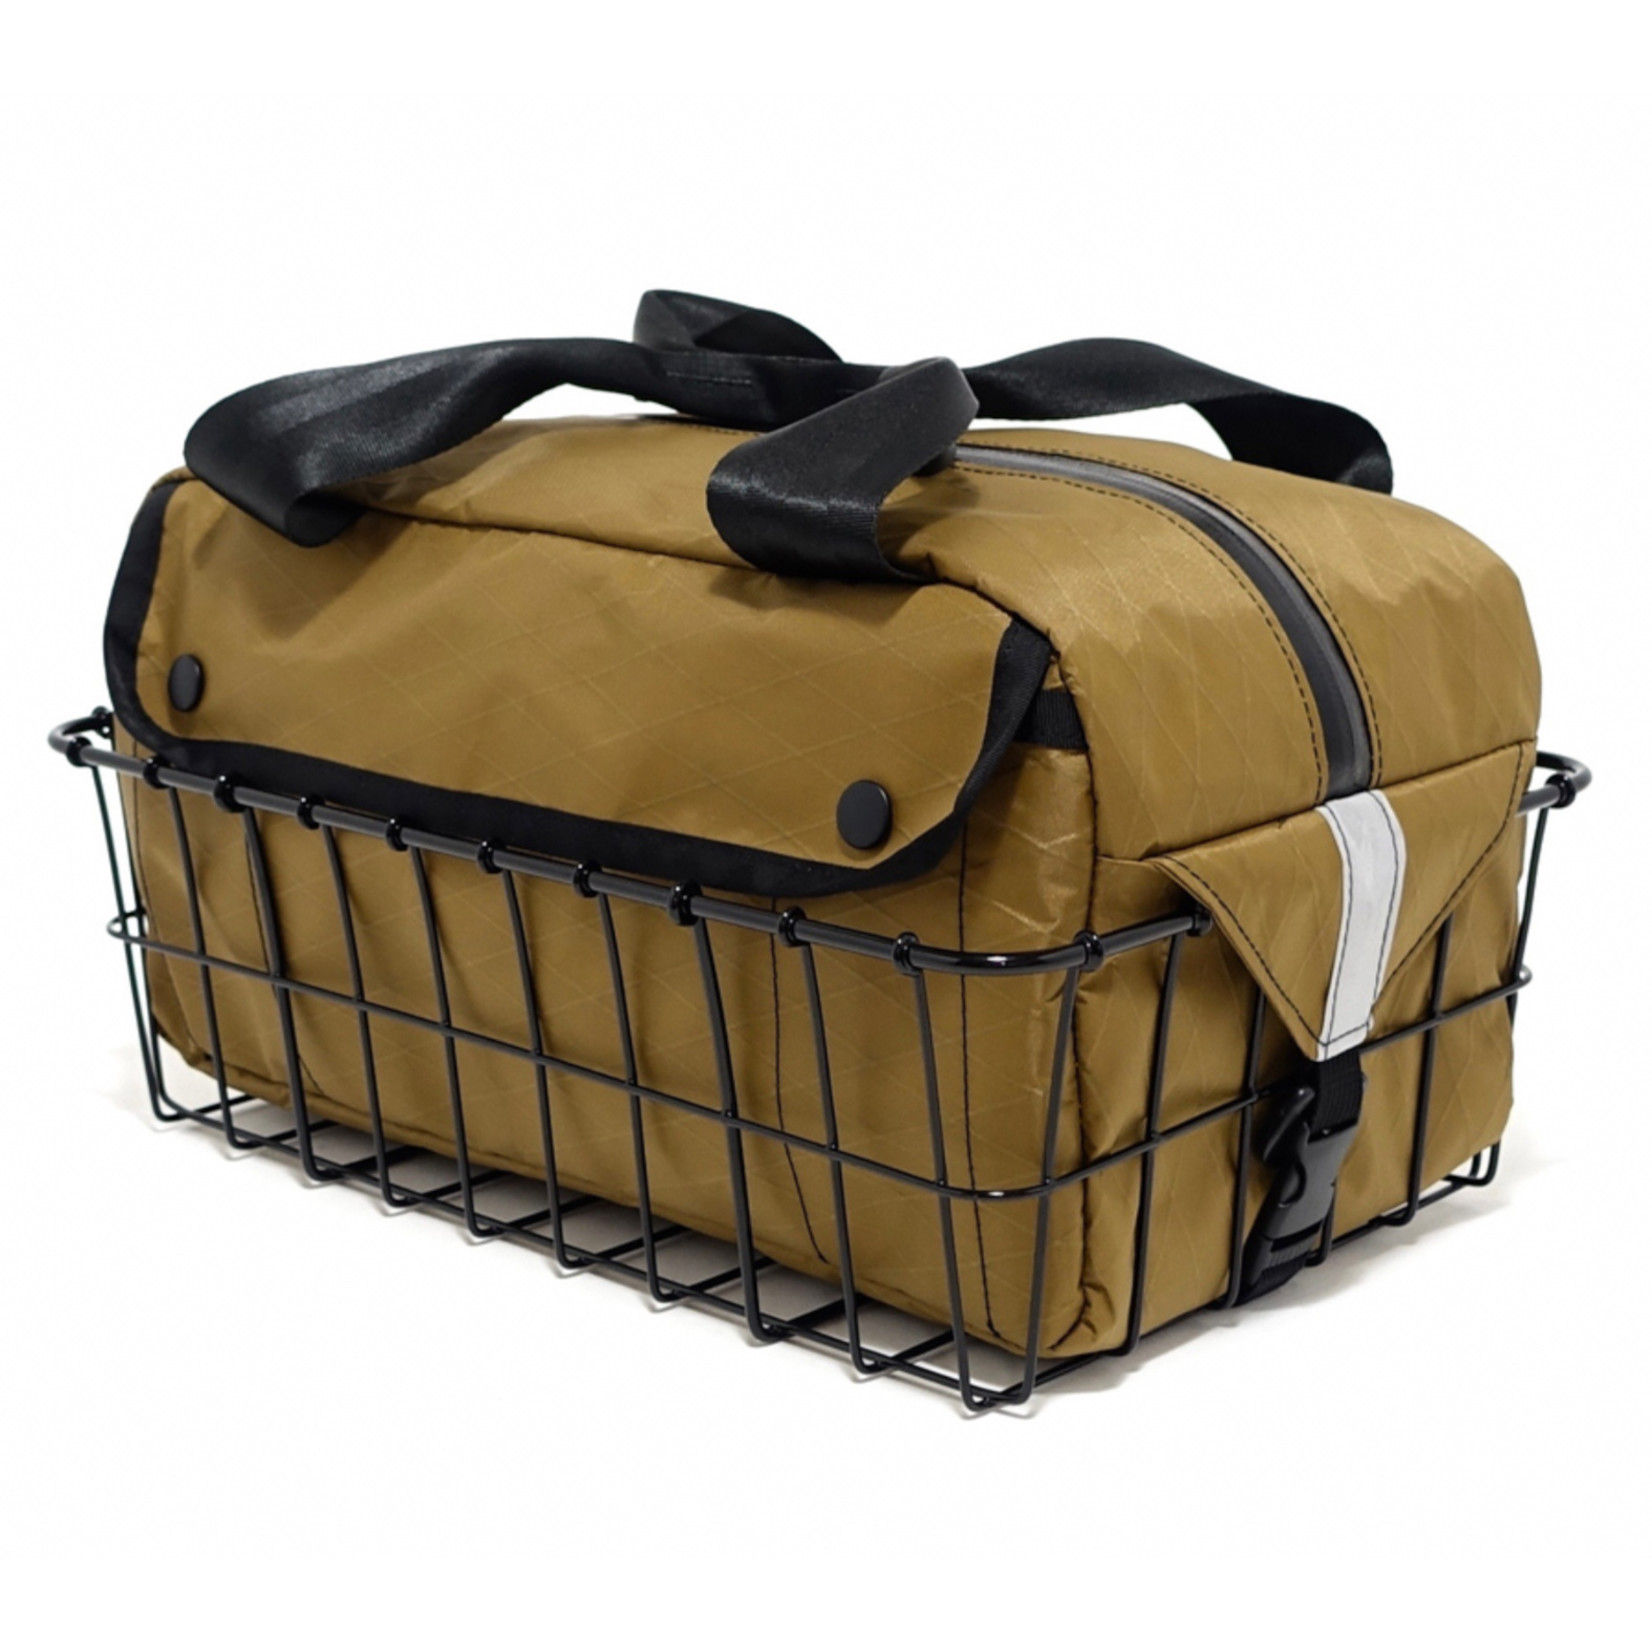 Swift Industries Swift Industries Sugarloaf Basket Bag